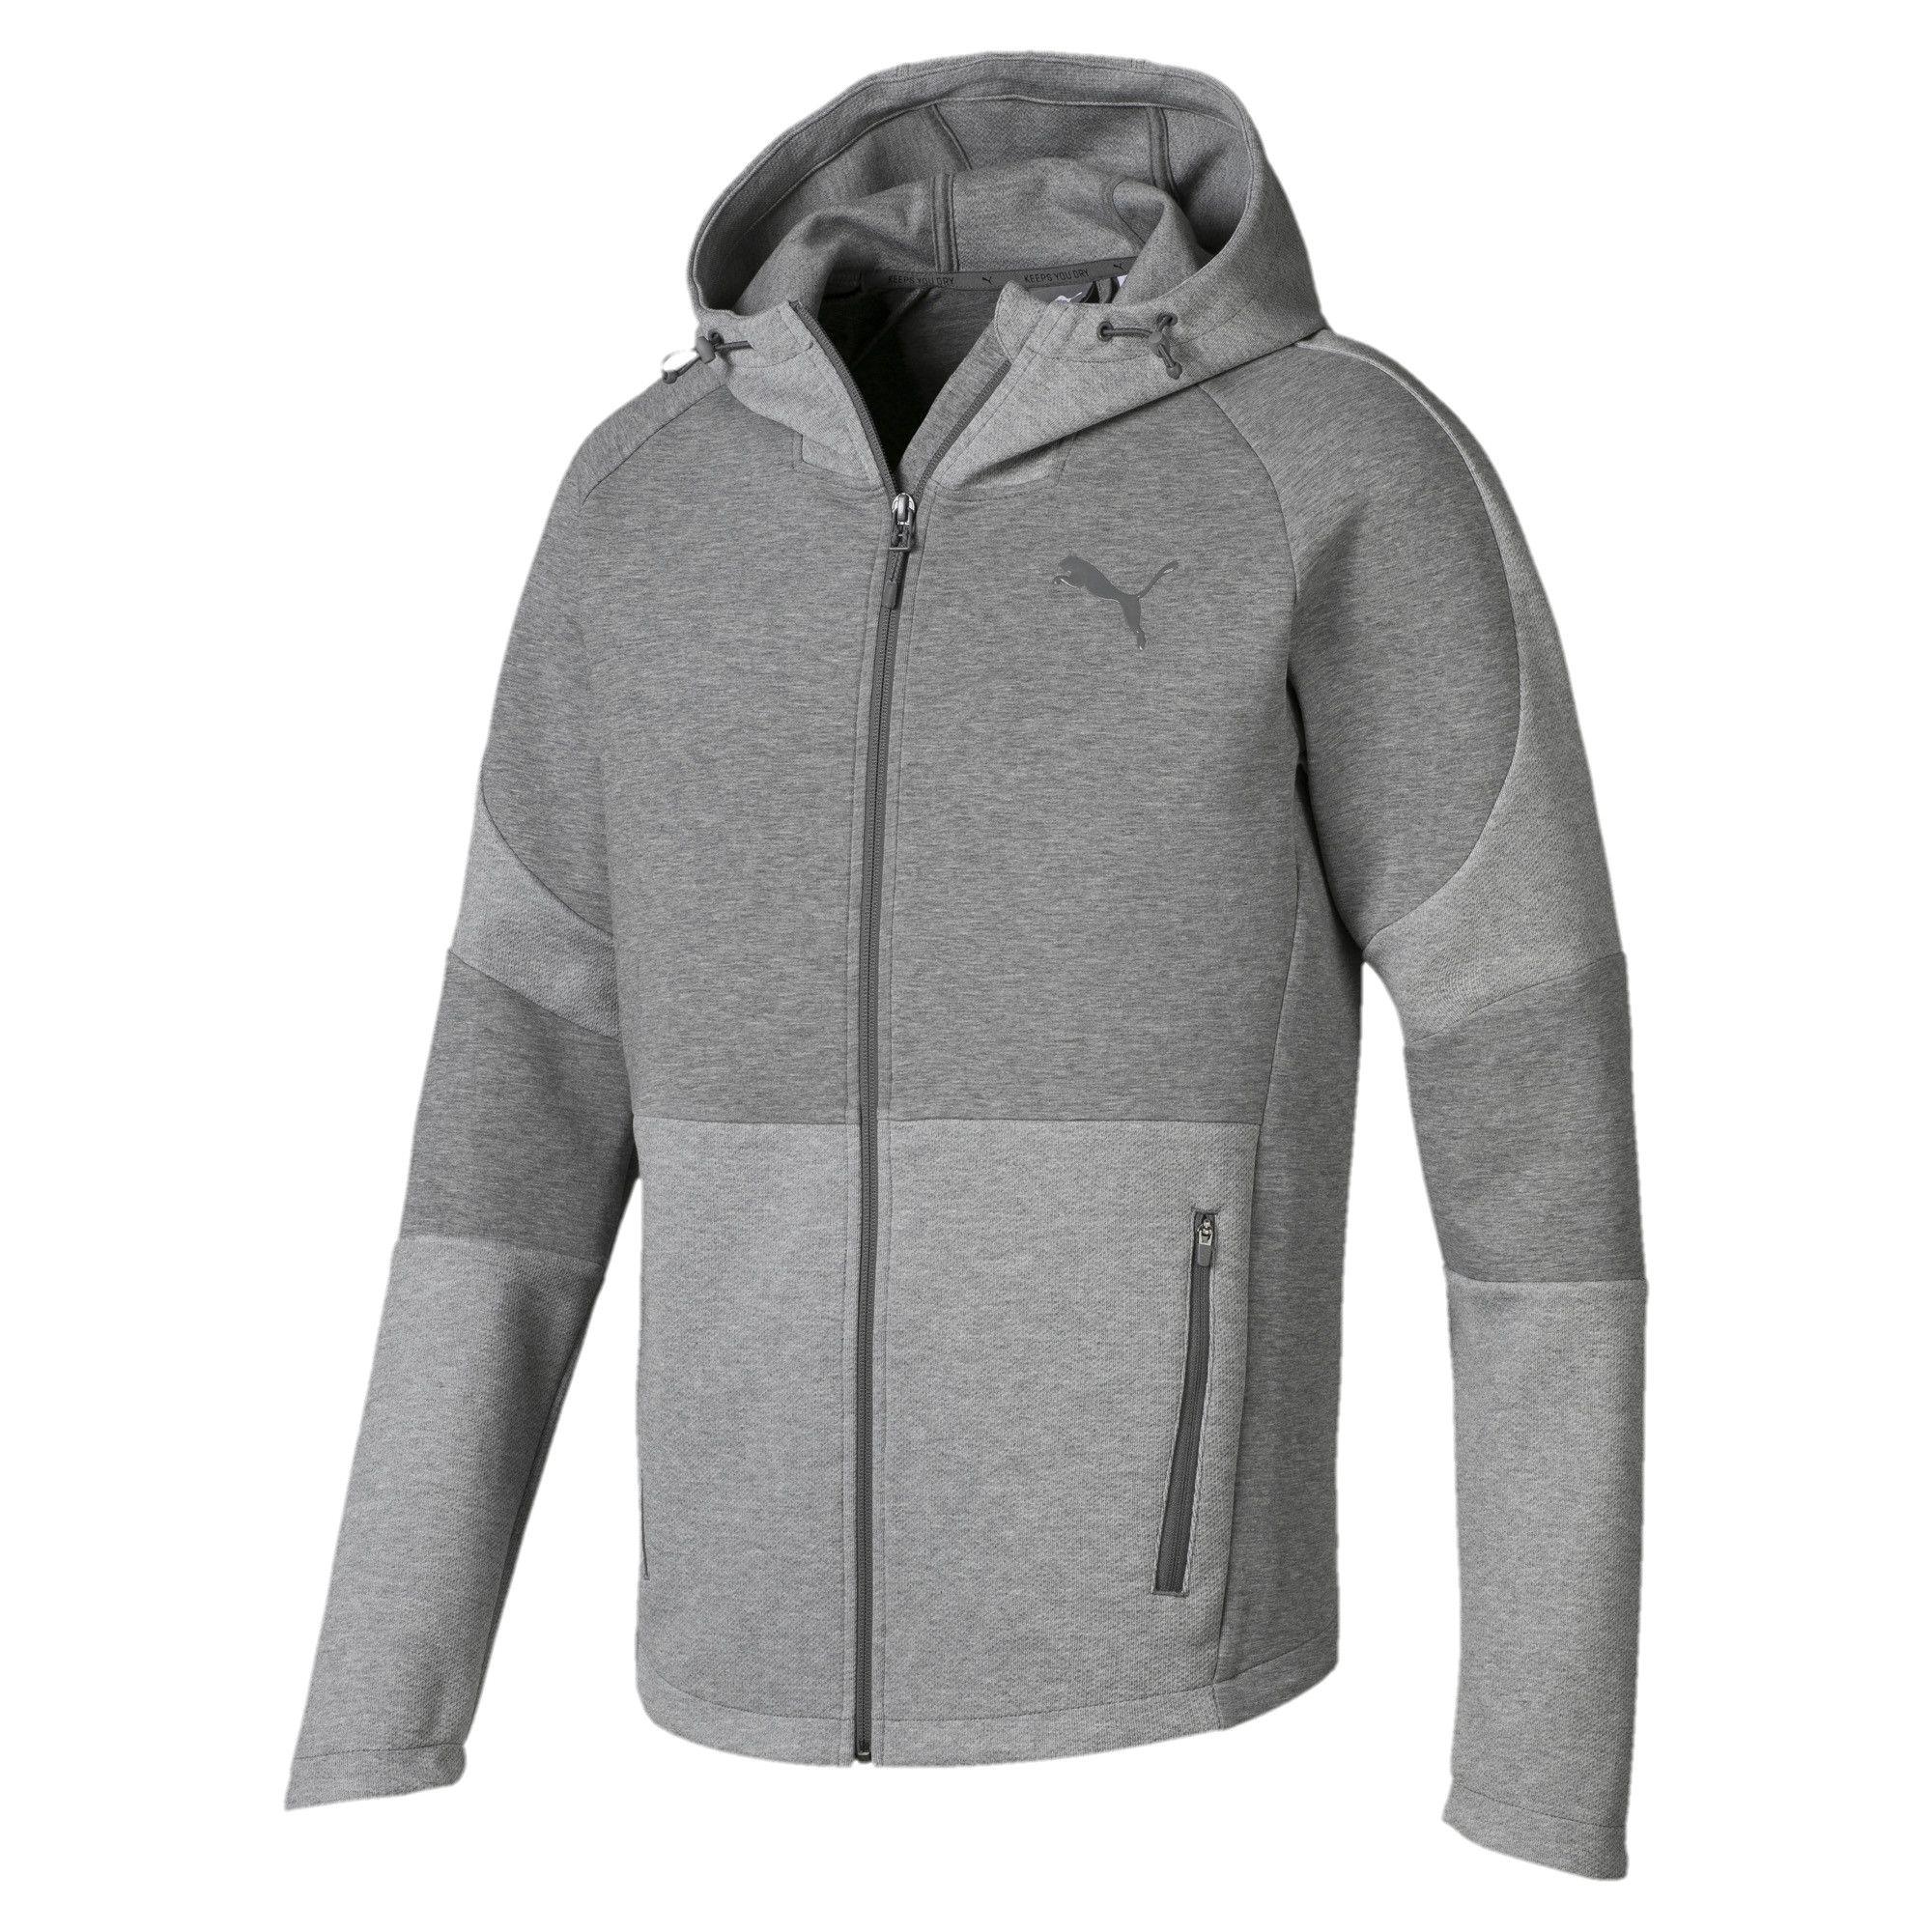 Evostripe Move Hooded Jacket | Medium Gray Heather | PUMA